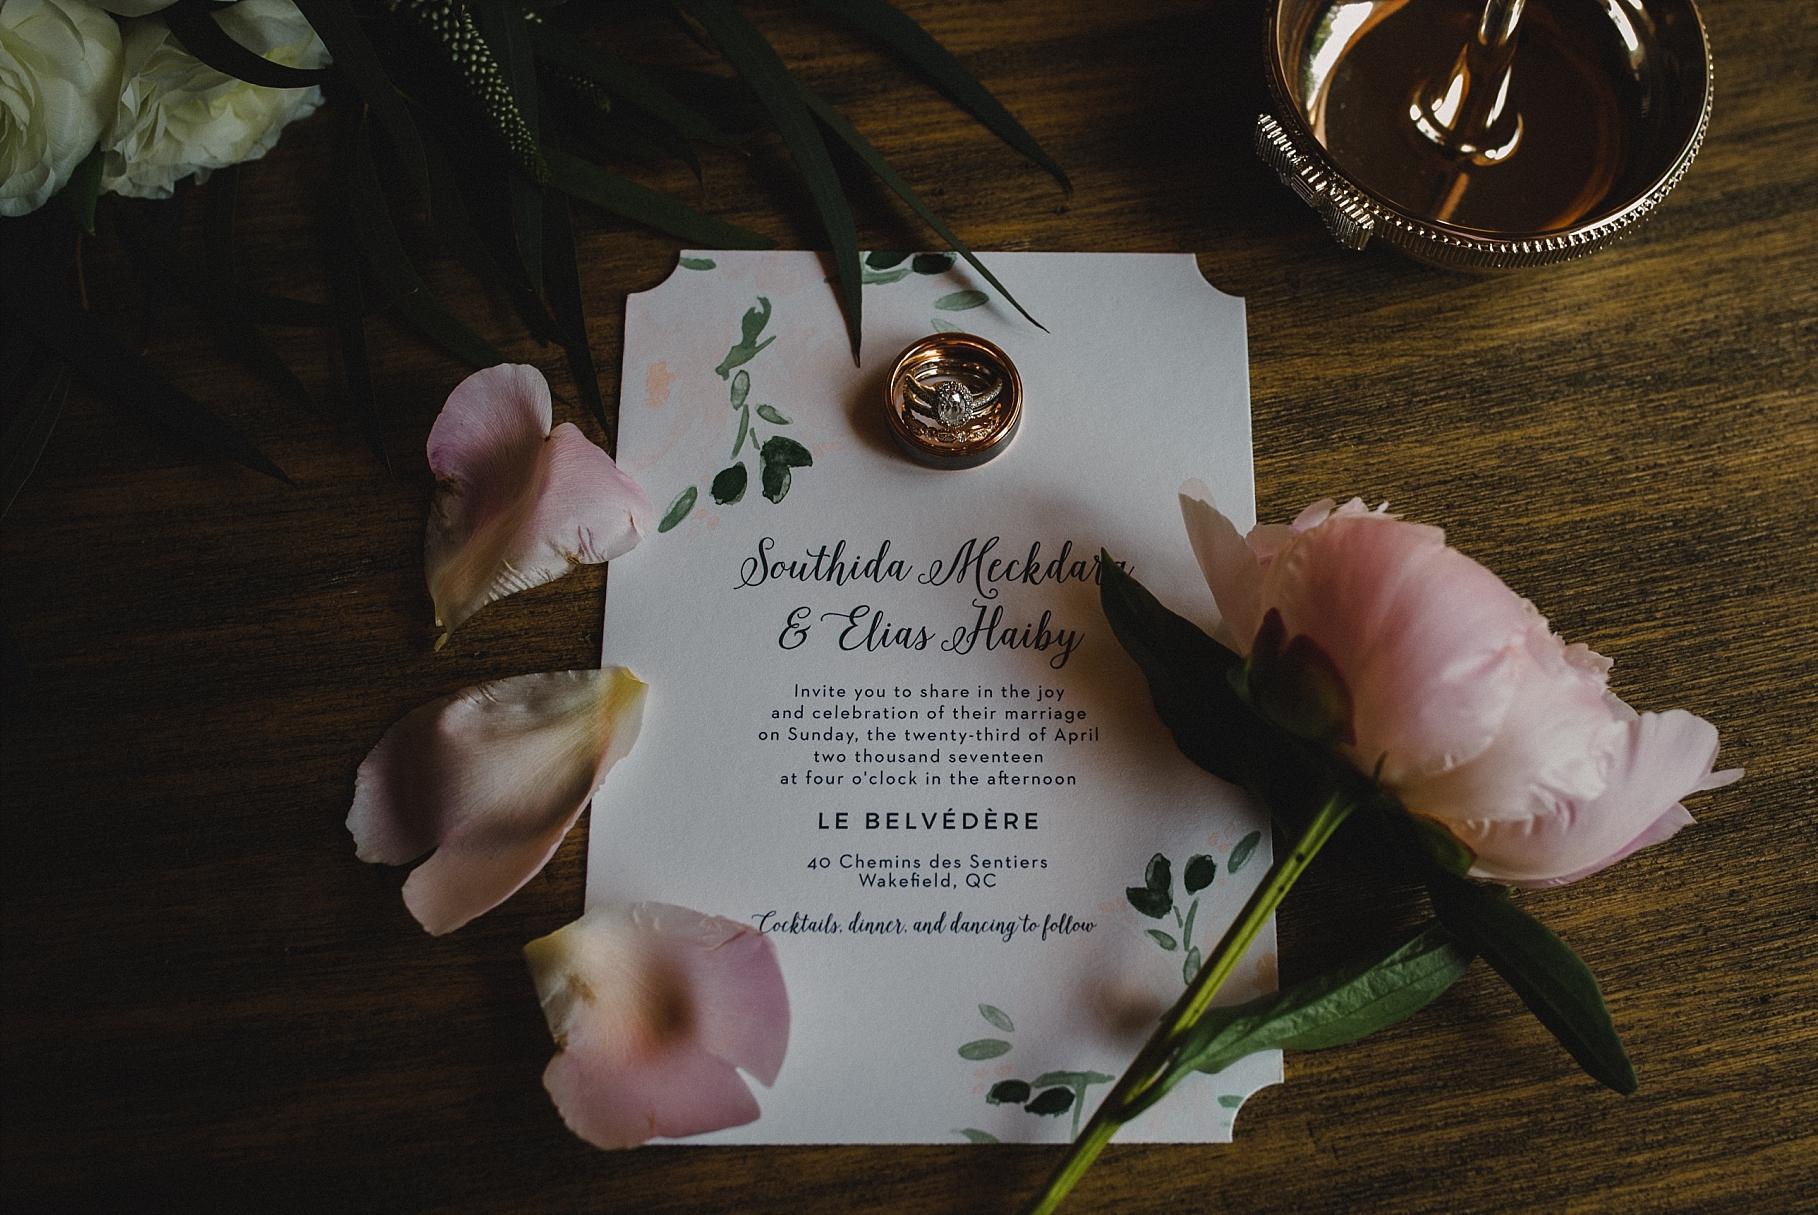 Le Belvedere Wedding invitation